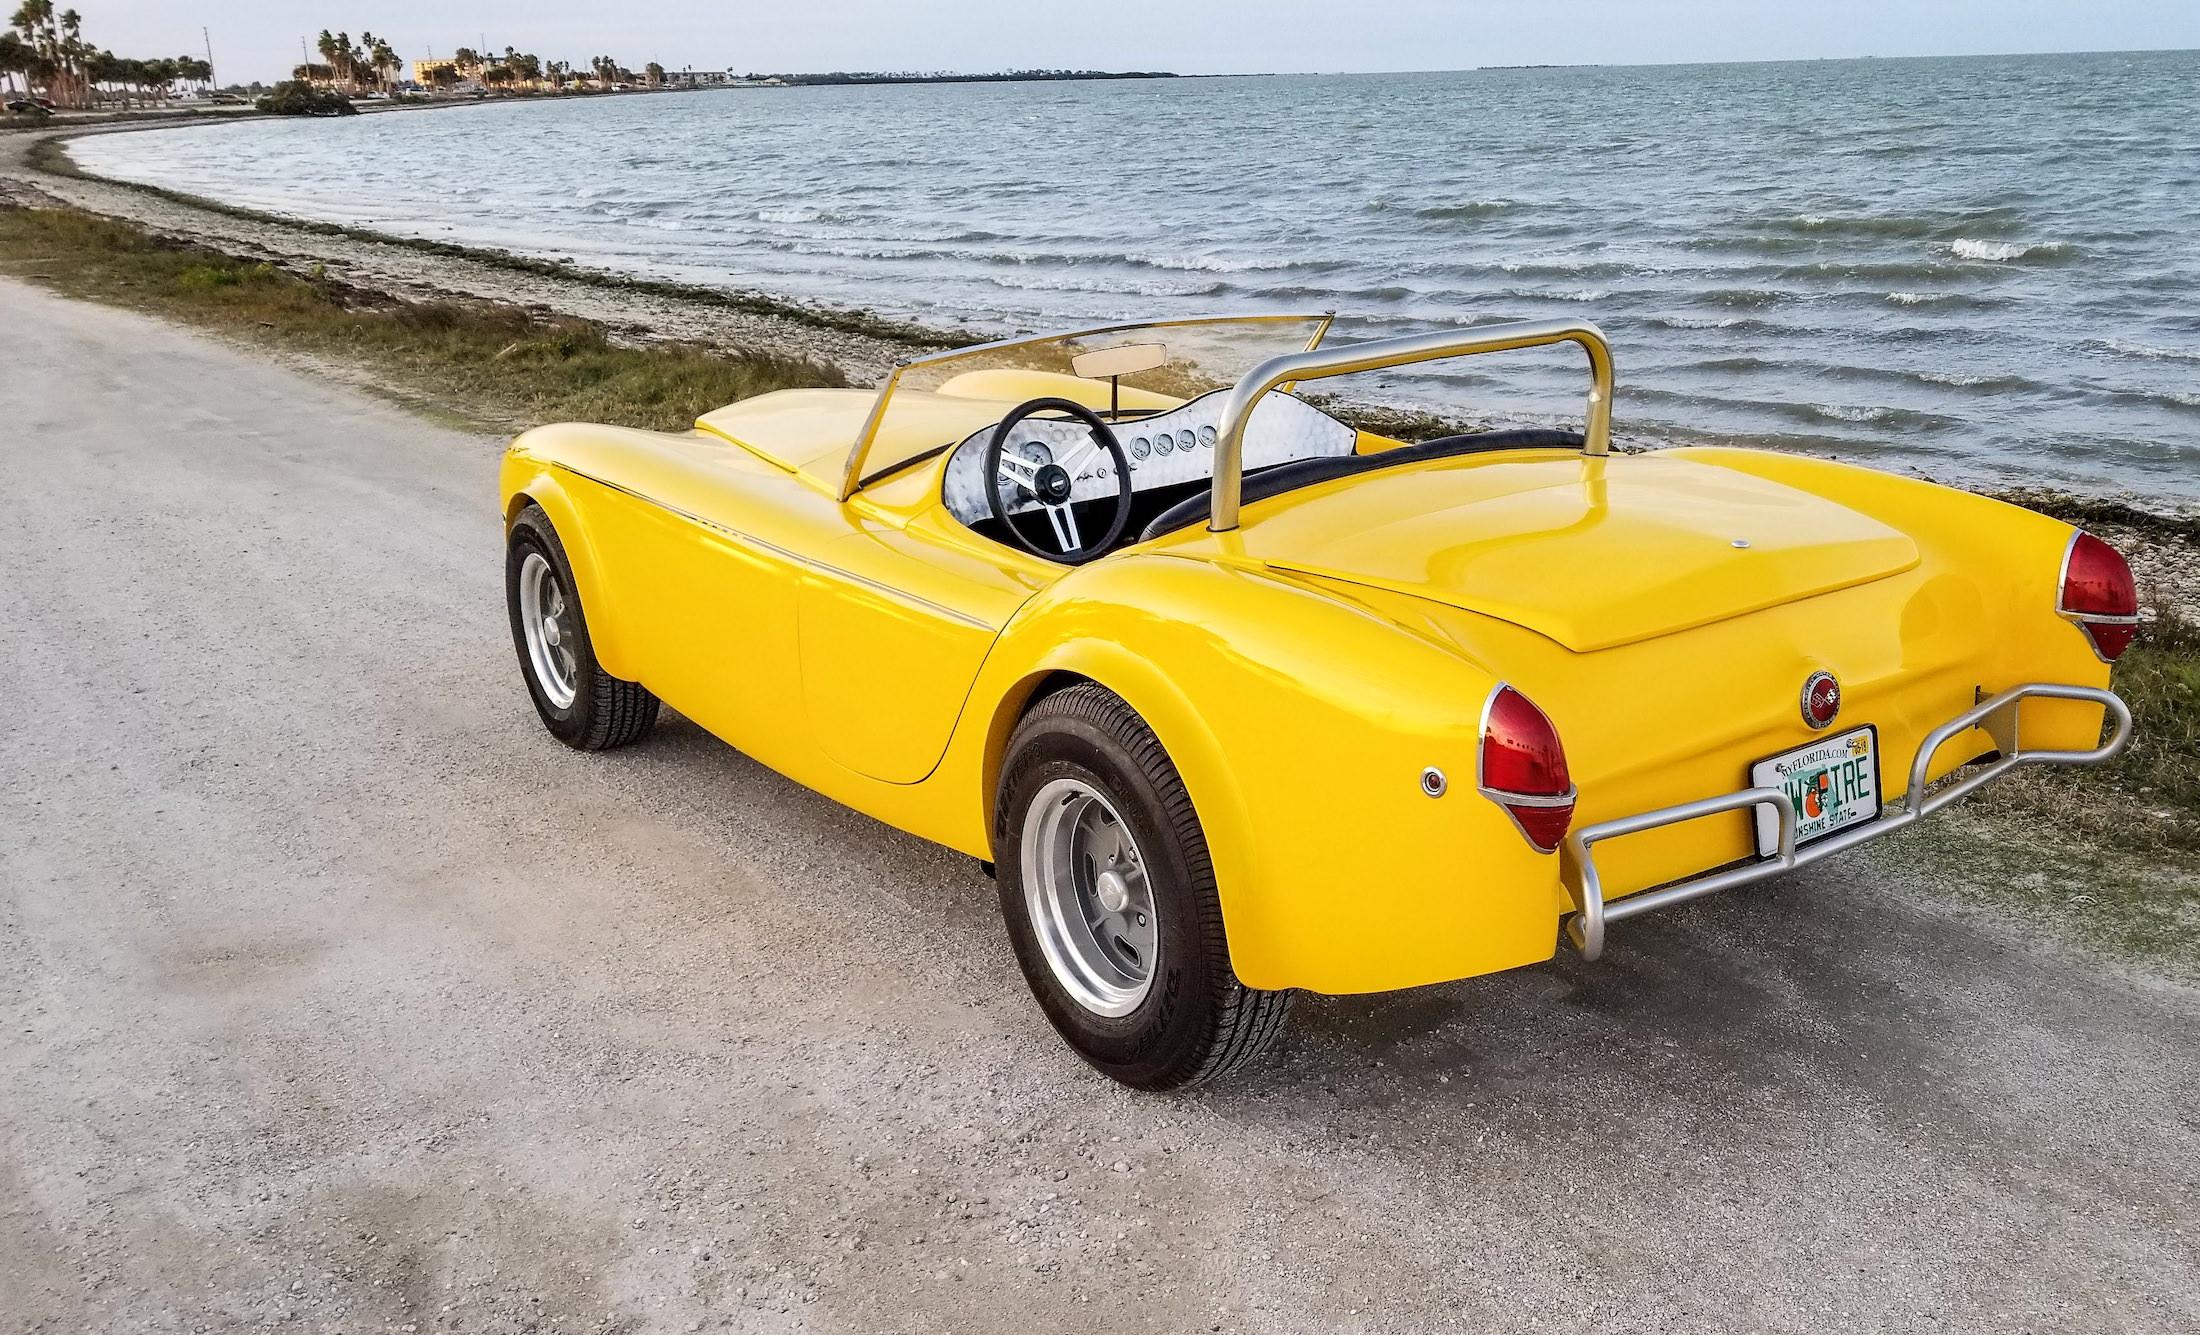 A Rare American Sports Car